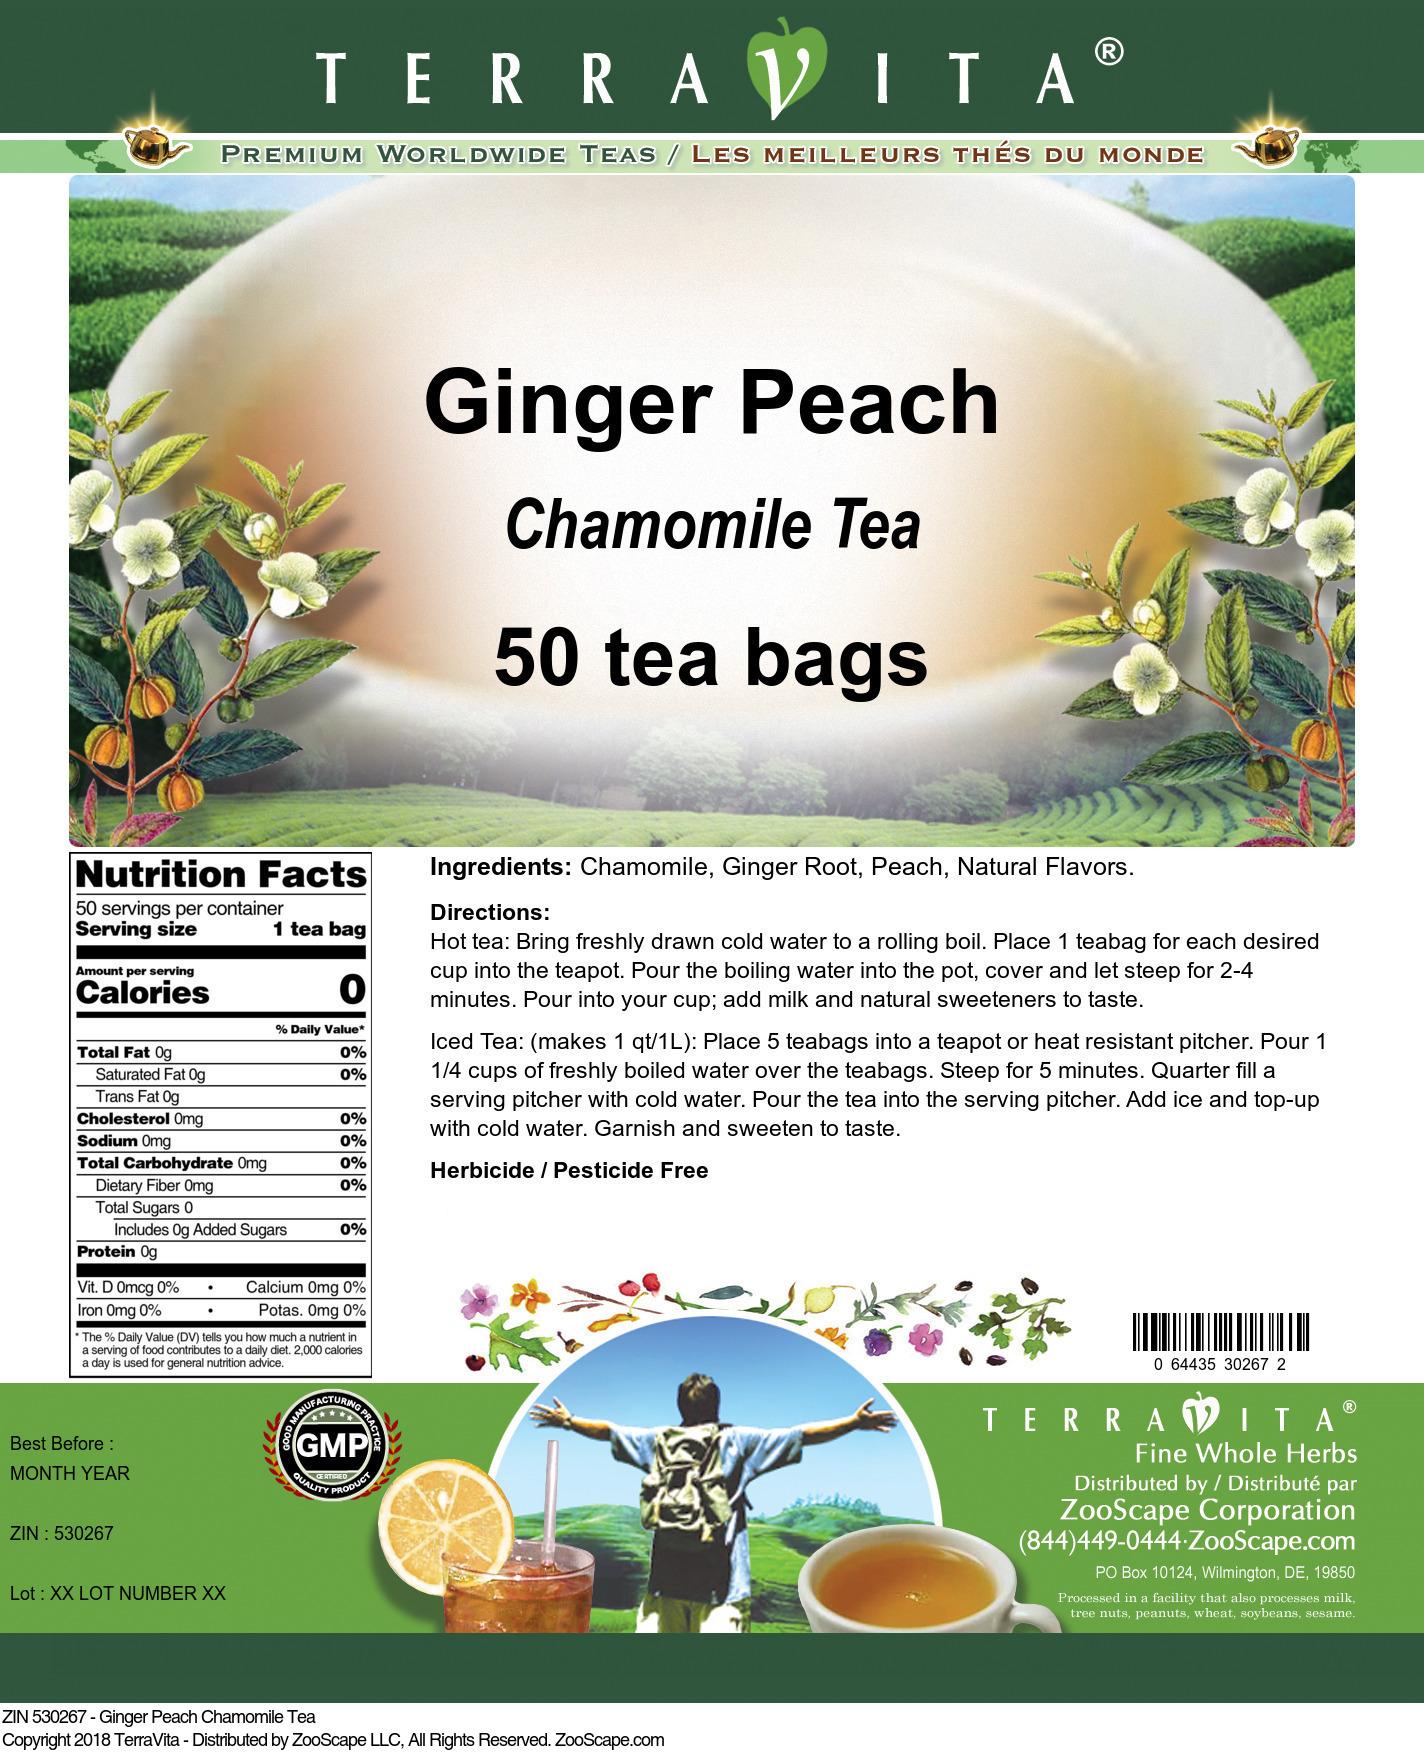 Ginger Peach Chamomile Tea